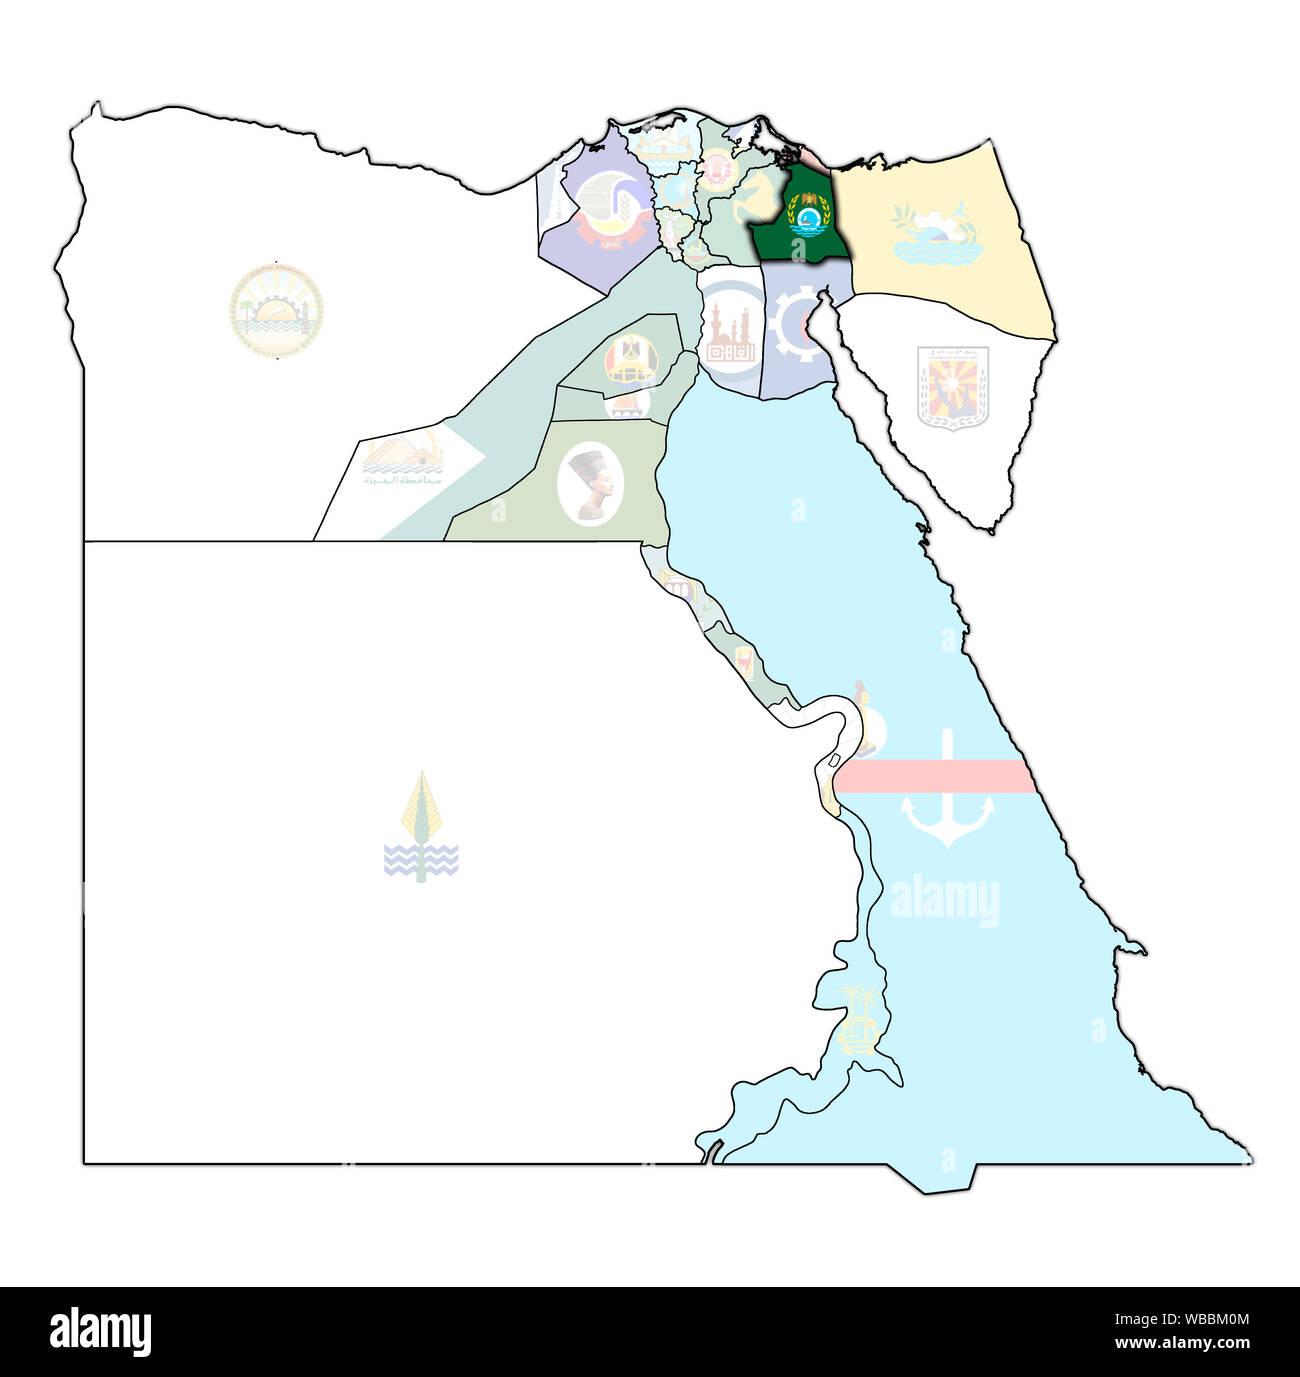 Escort girls in Ismailia